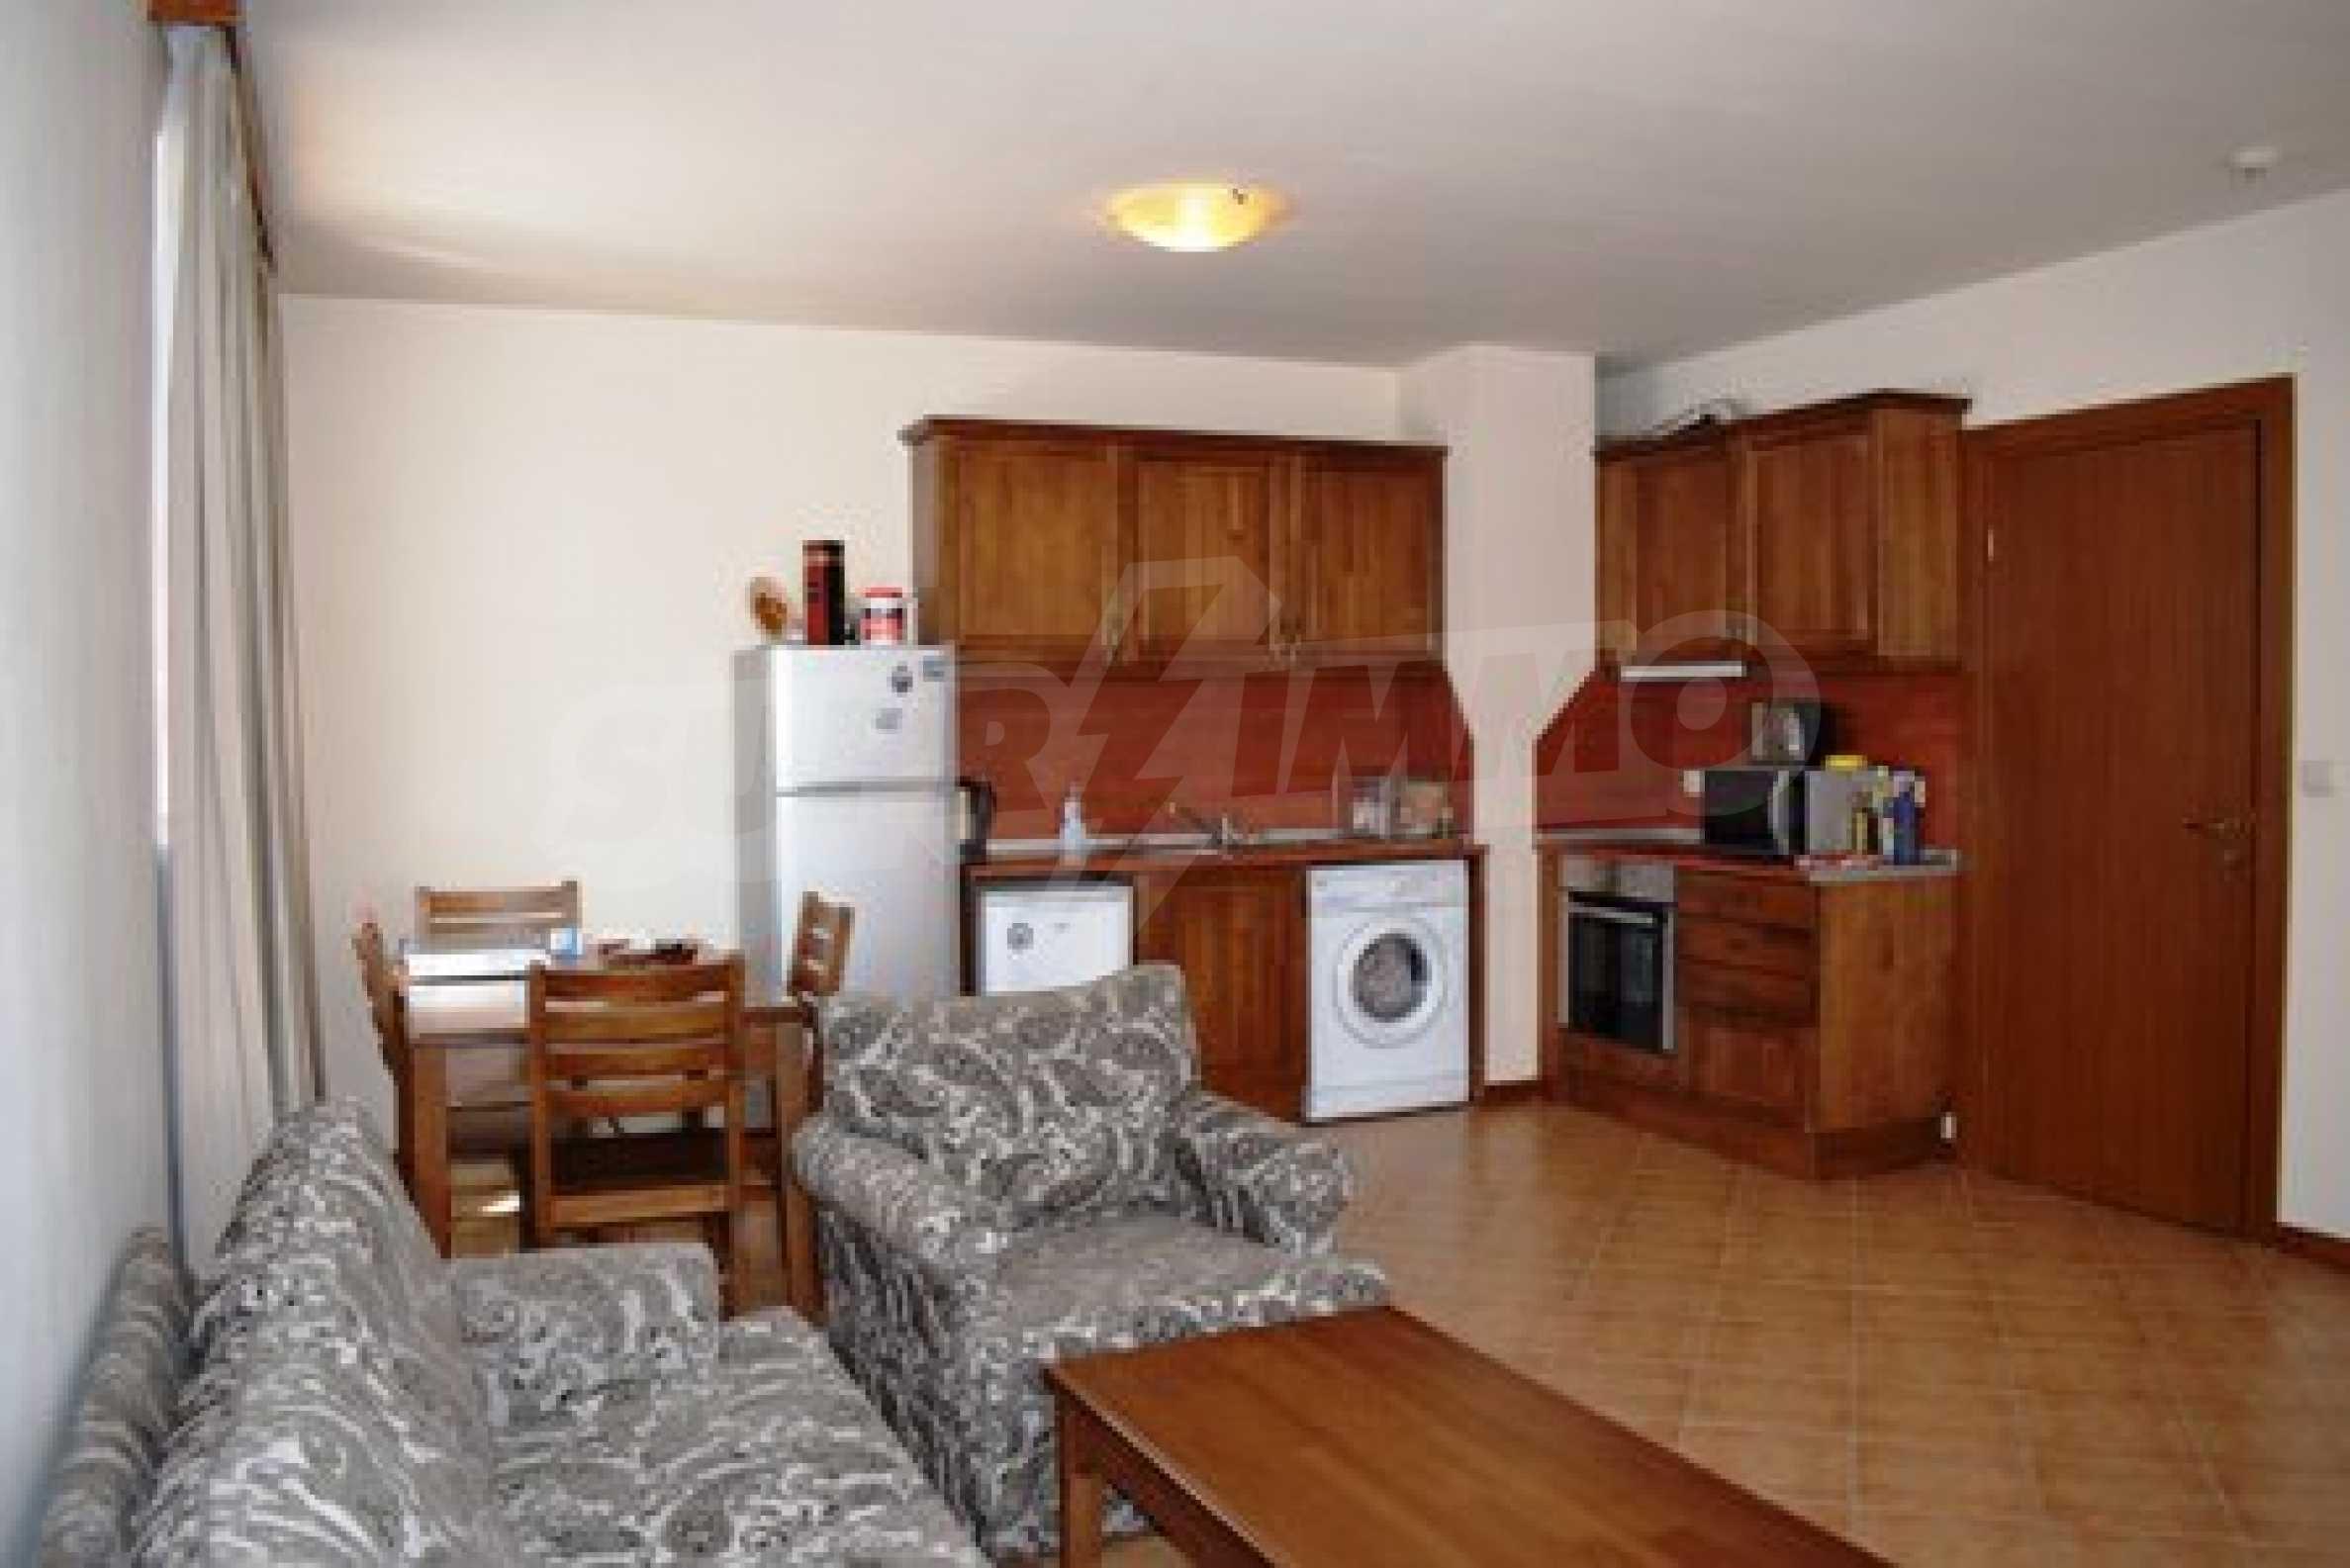 Двустаен апартамент в близост до голф клуб в района на Банско и Разлог 3